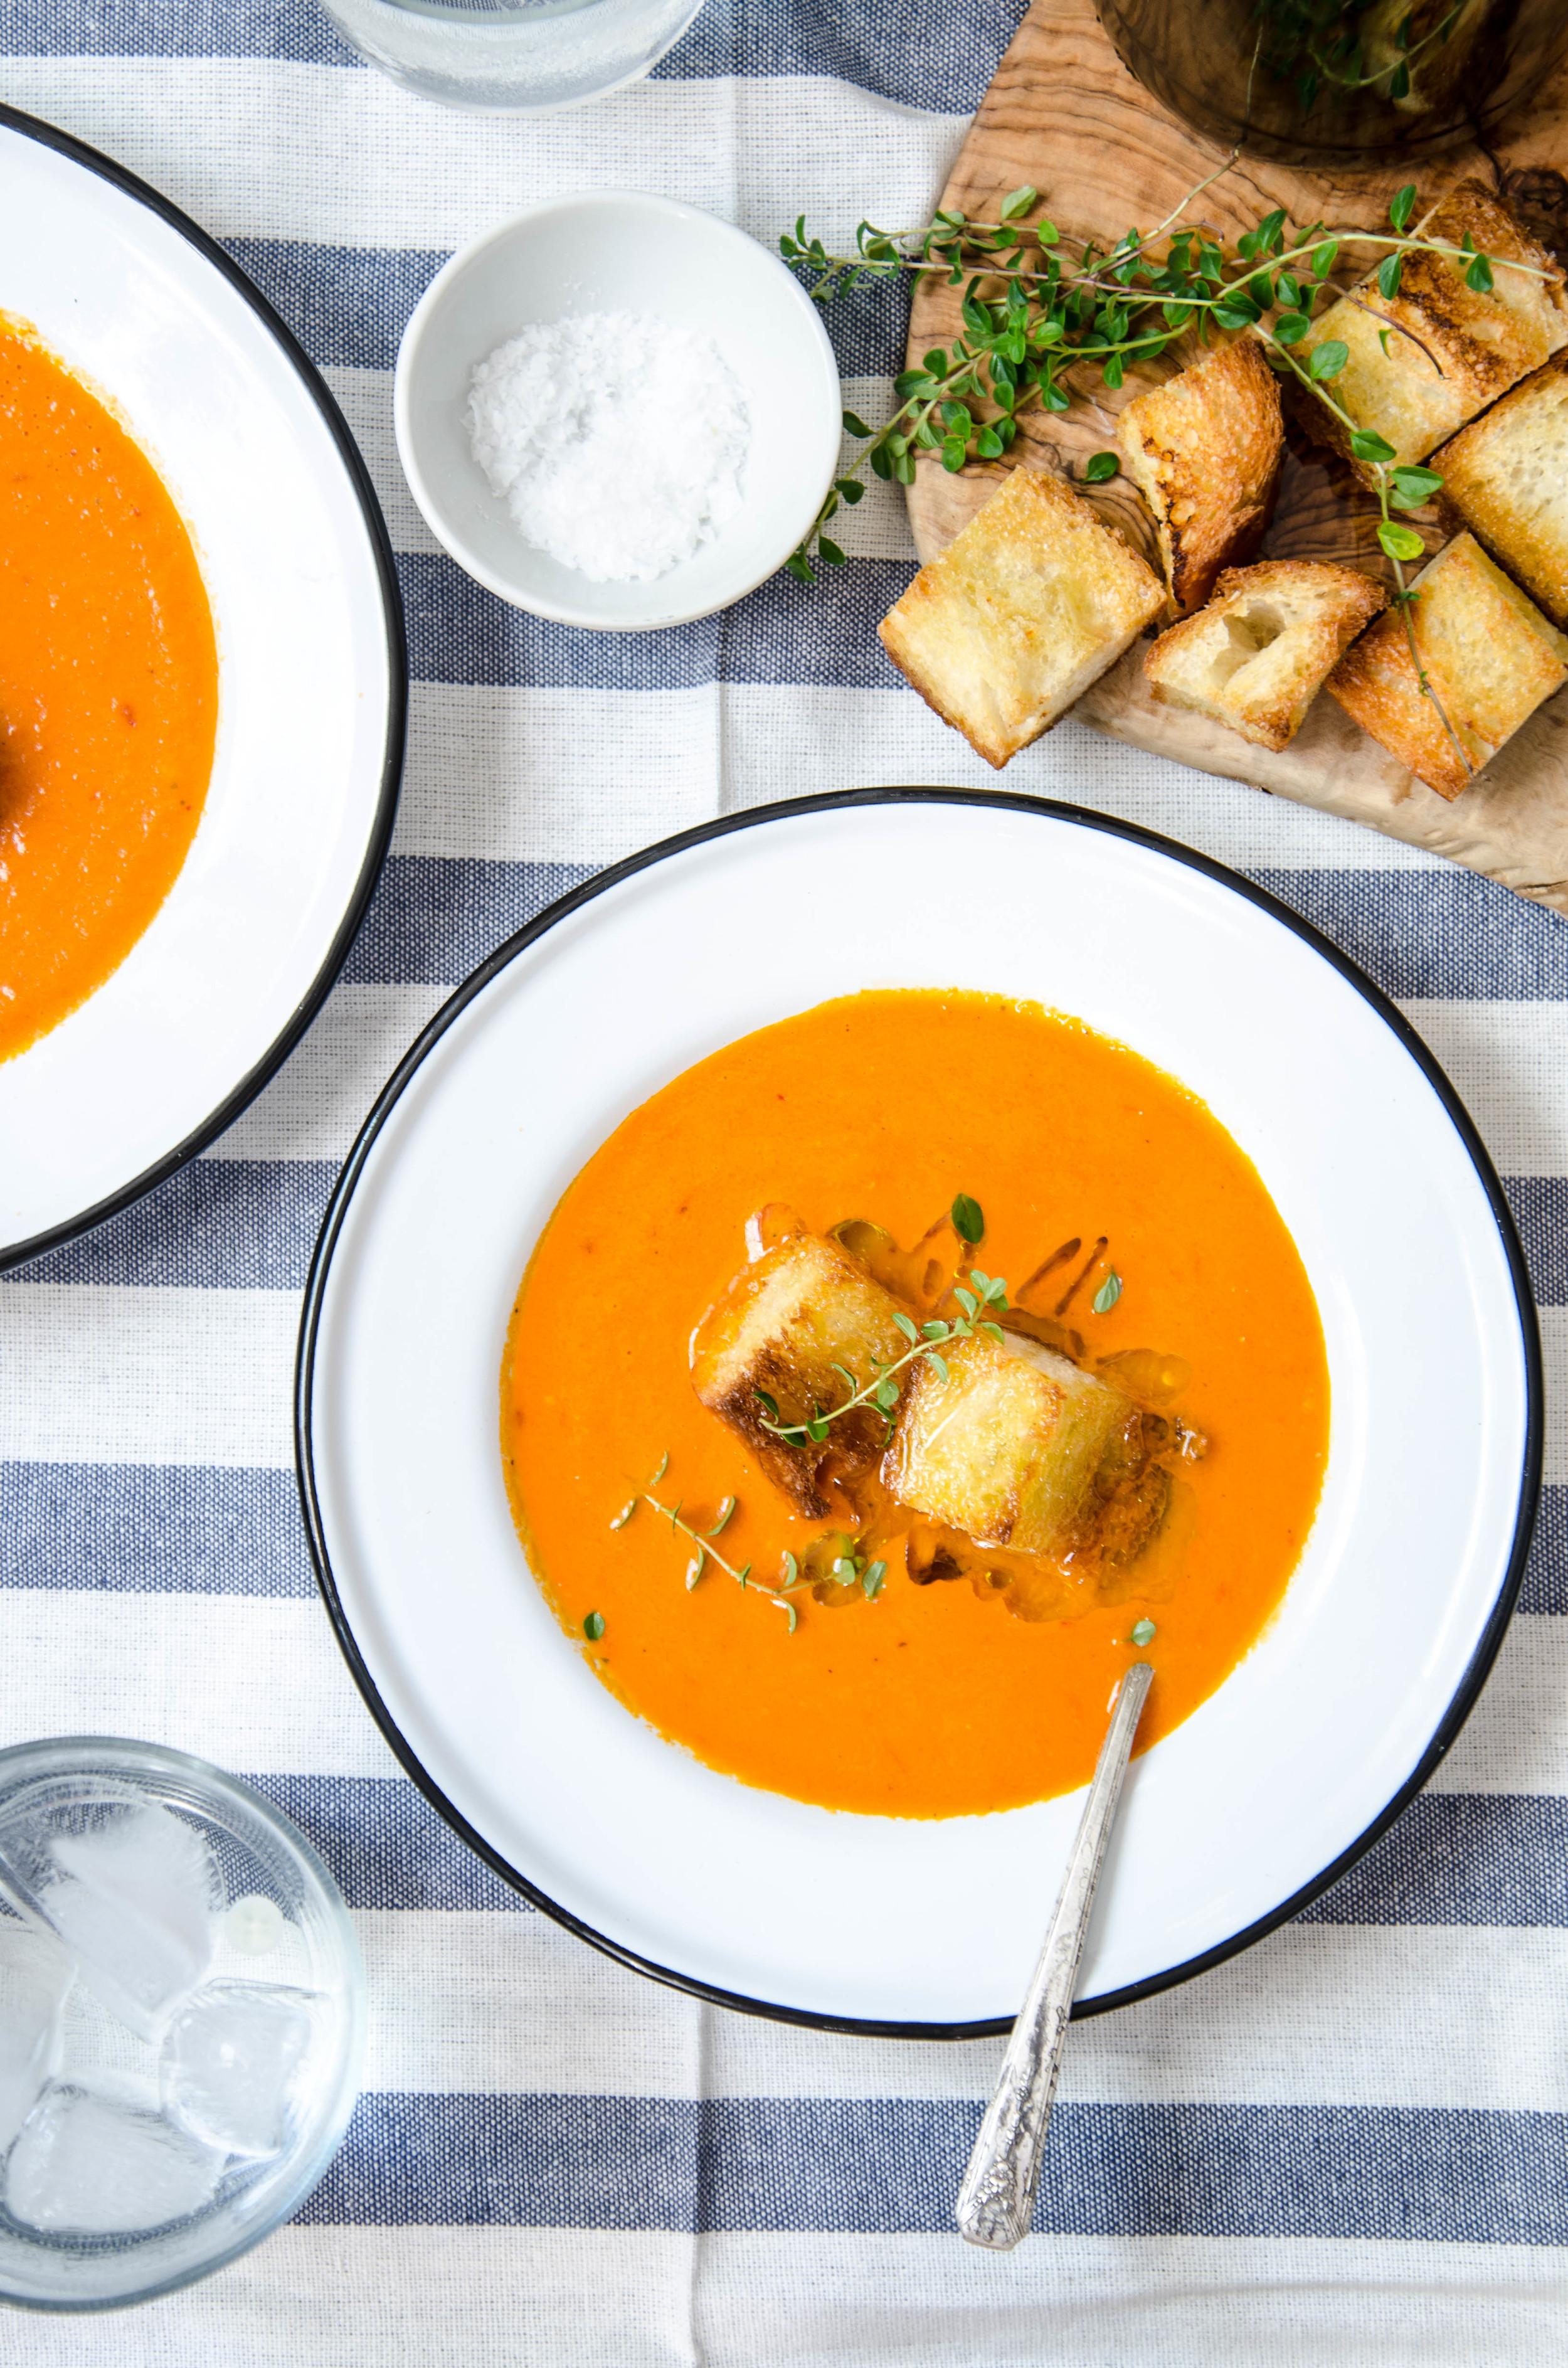 ROSE & IVY Jornal Roasted Tomato Soap